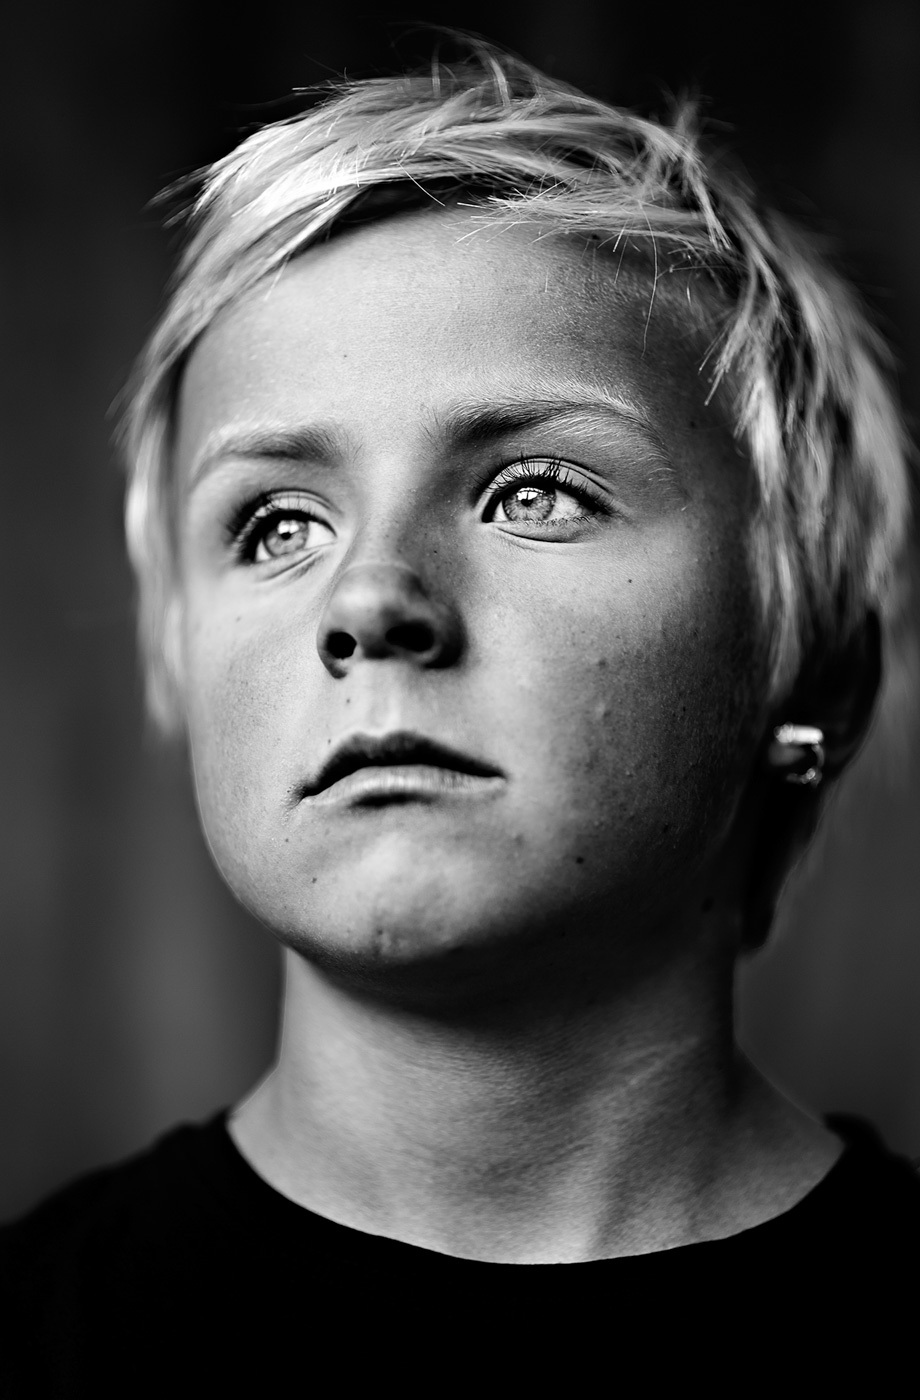 Eddie Clybouw - portret van 1 persoon